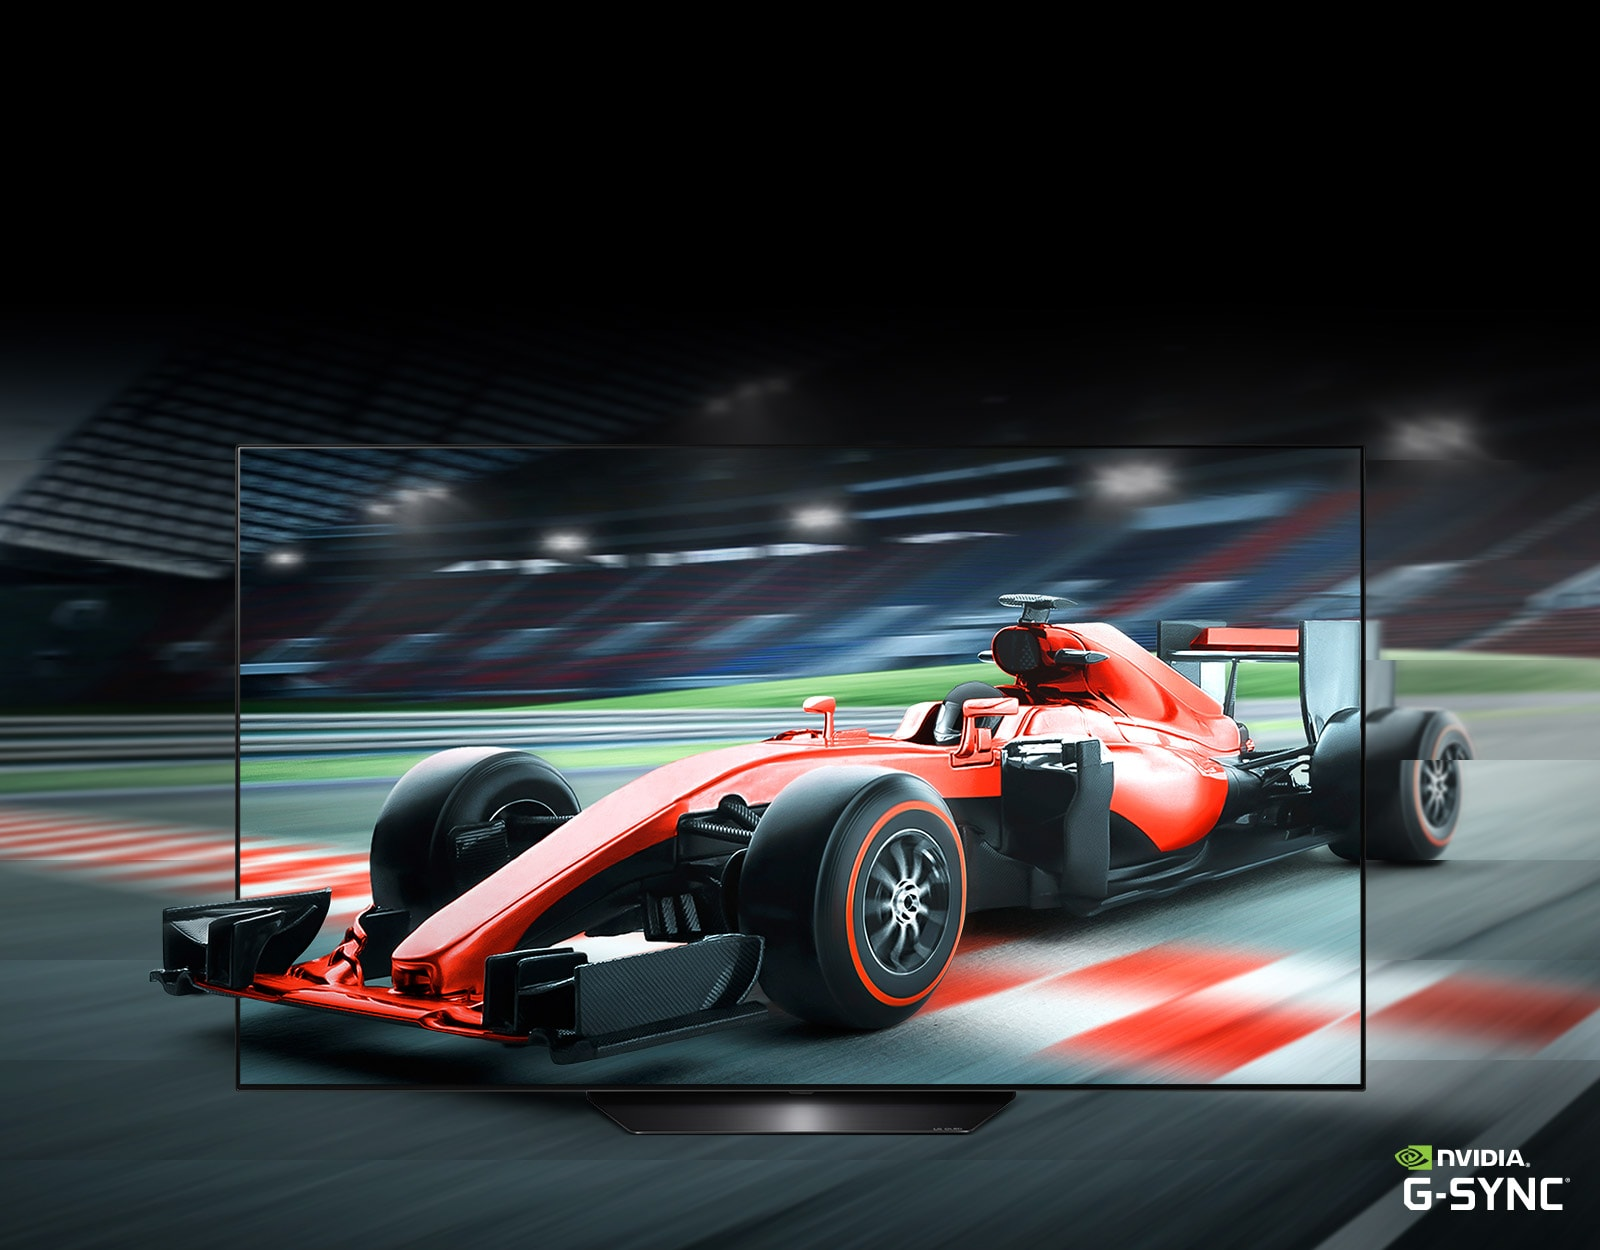 LG OLED TV - A PC Gamers Dream Come True1